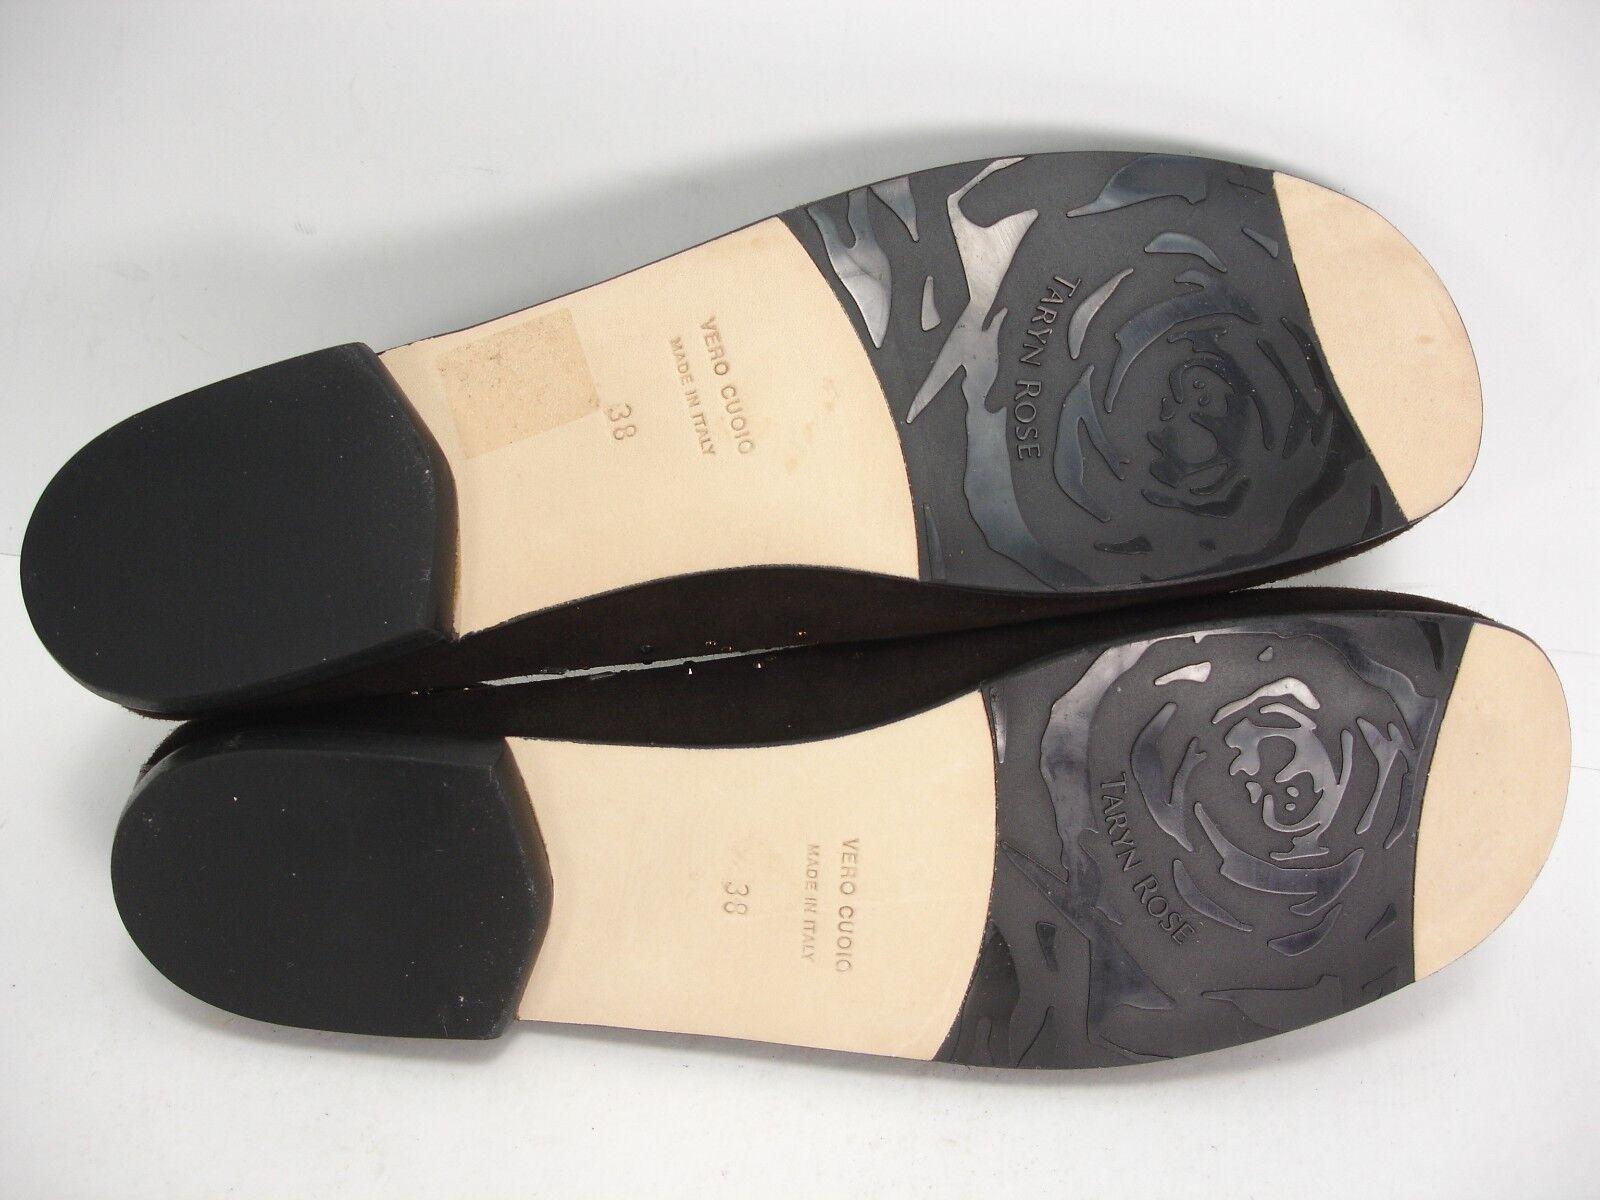 NEW TARYN SLIP ROSE BROWN SUEDE CRYSTALS SLIP TARYN ON BALLET FLATS Schuhe WOMEN'S 38 M 9d1489